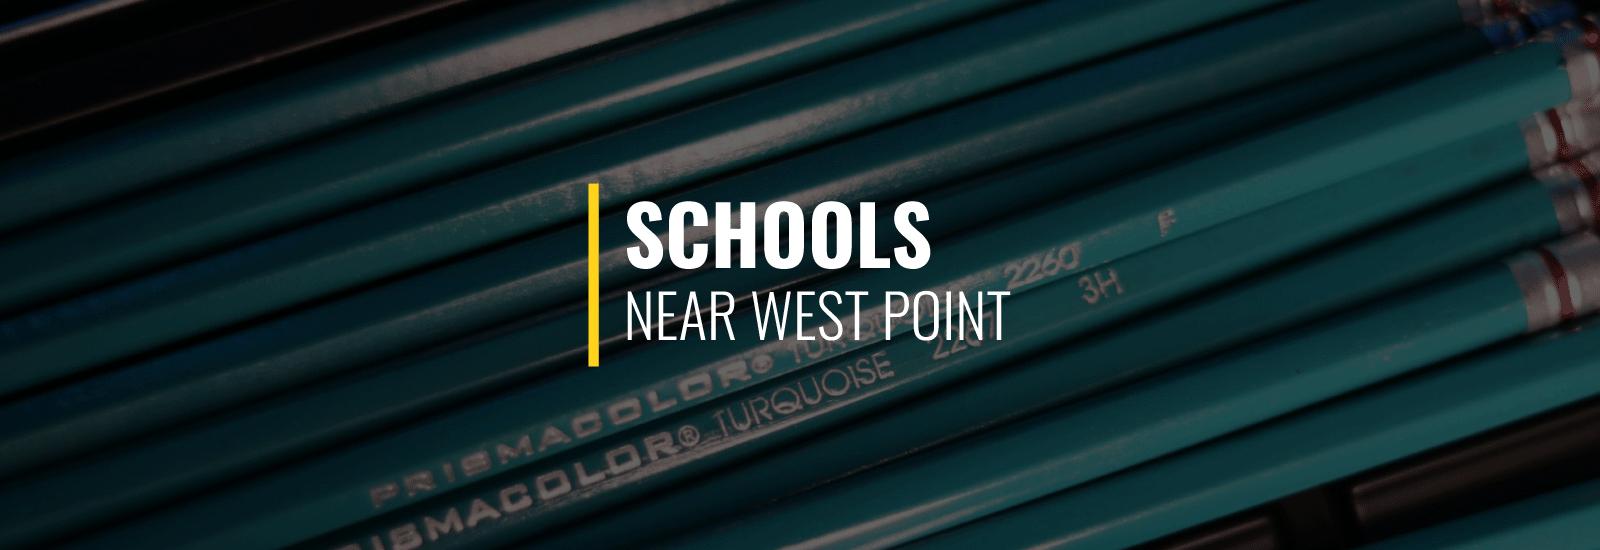 West Point Schools